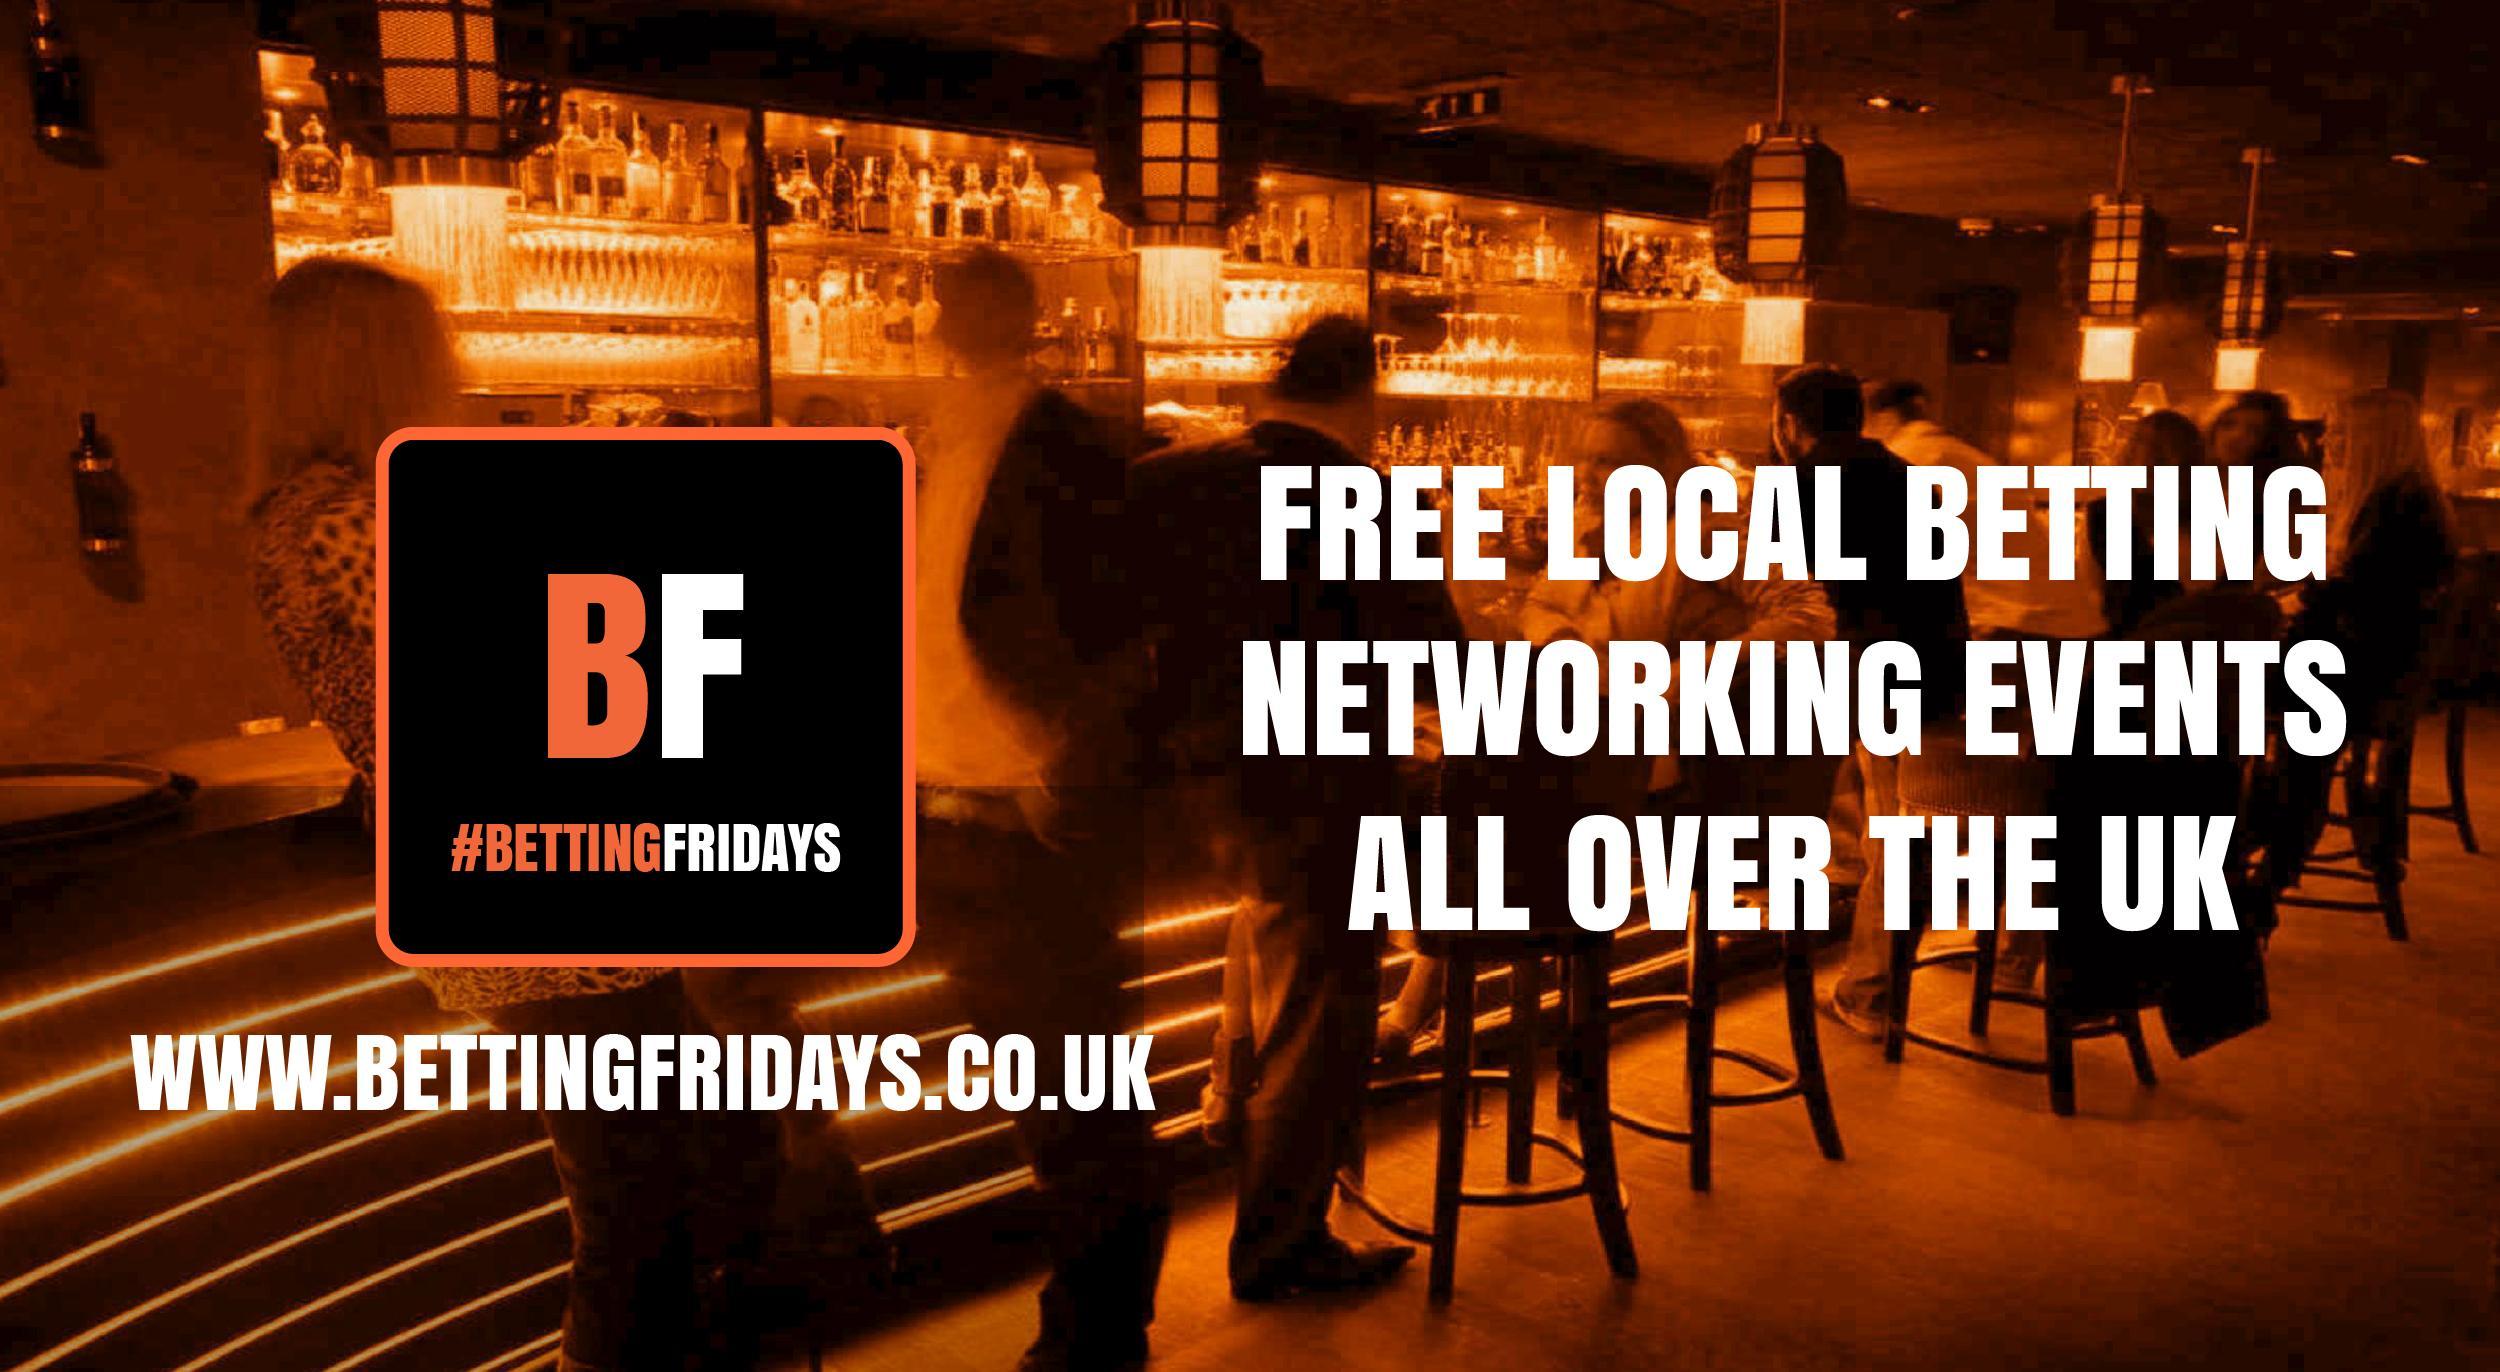 Betting Fridays! Free betting networking event in Ilkeston